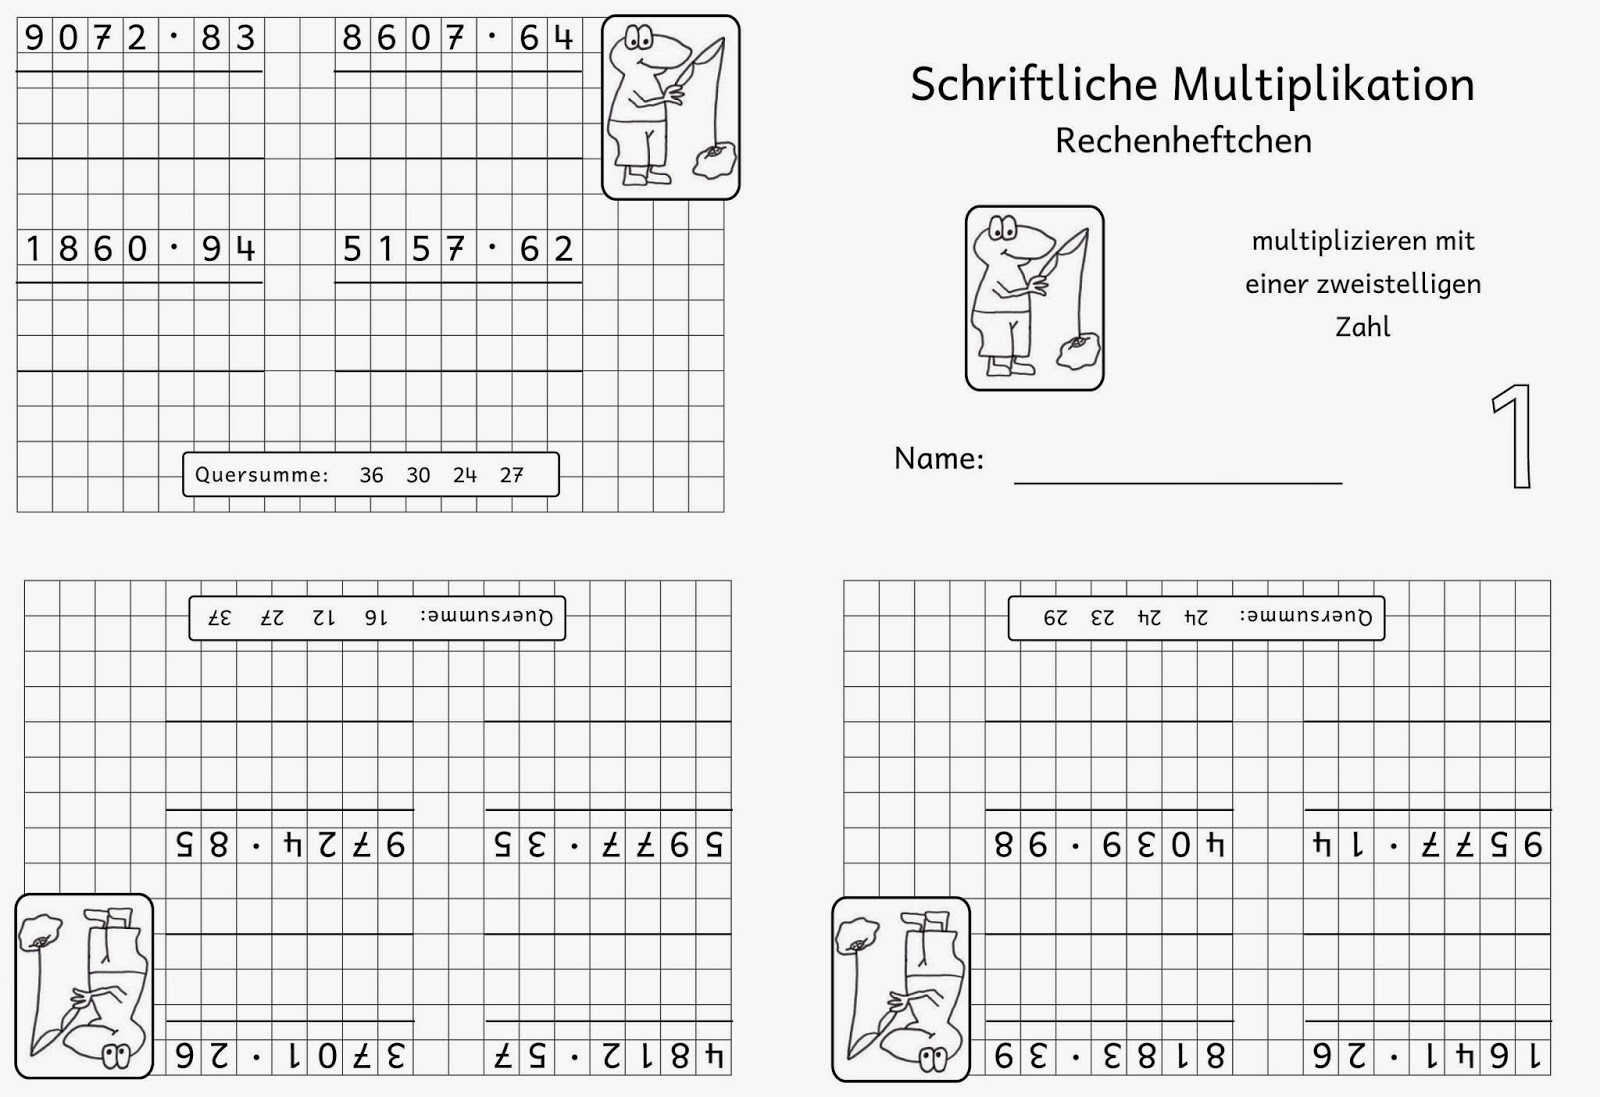 Klecksaufgaben mathe 3 klasse entwurf 3901115 - memorables.info